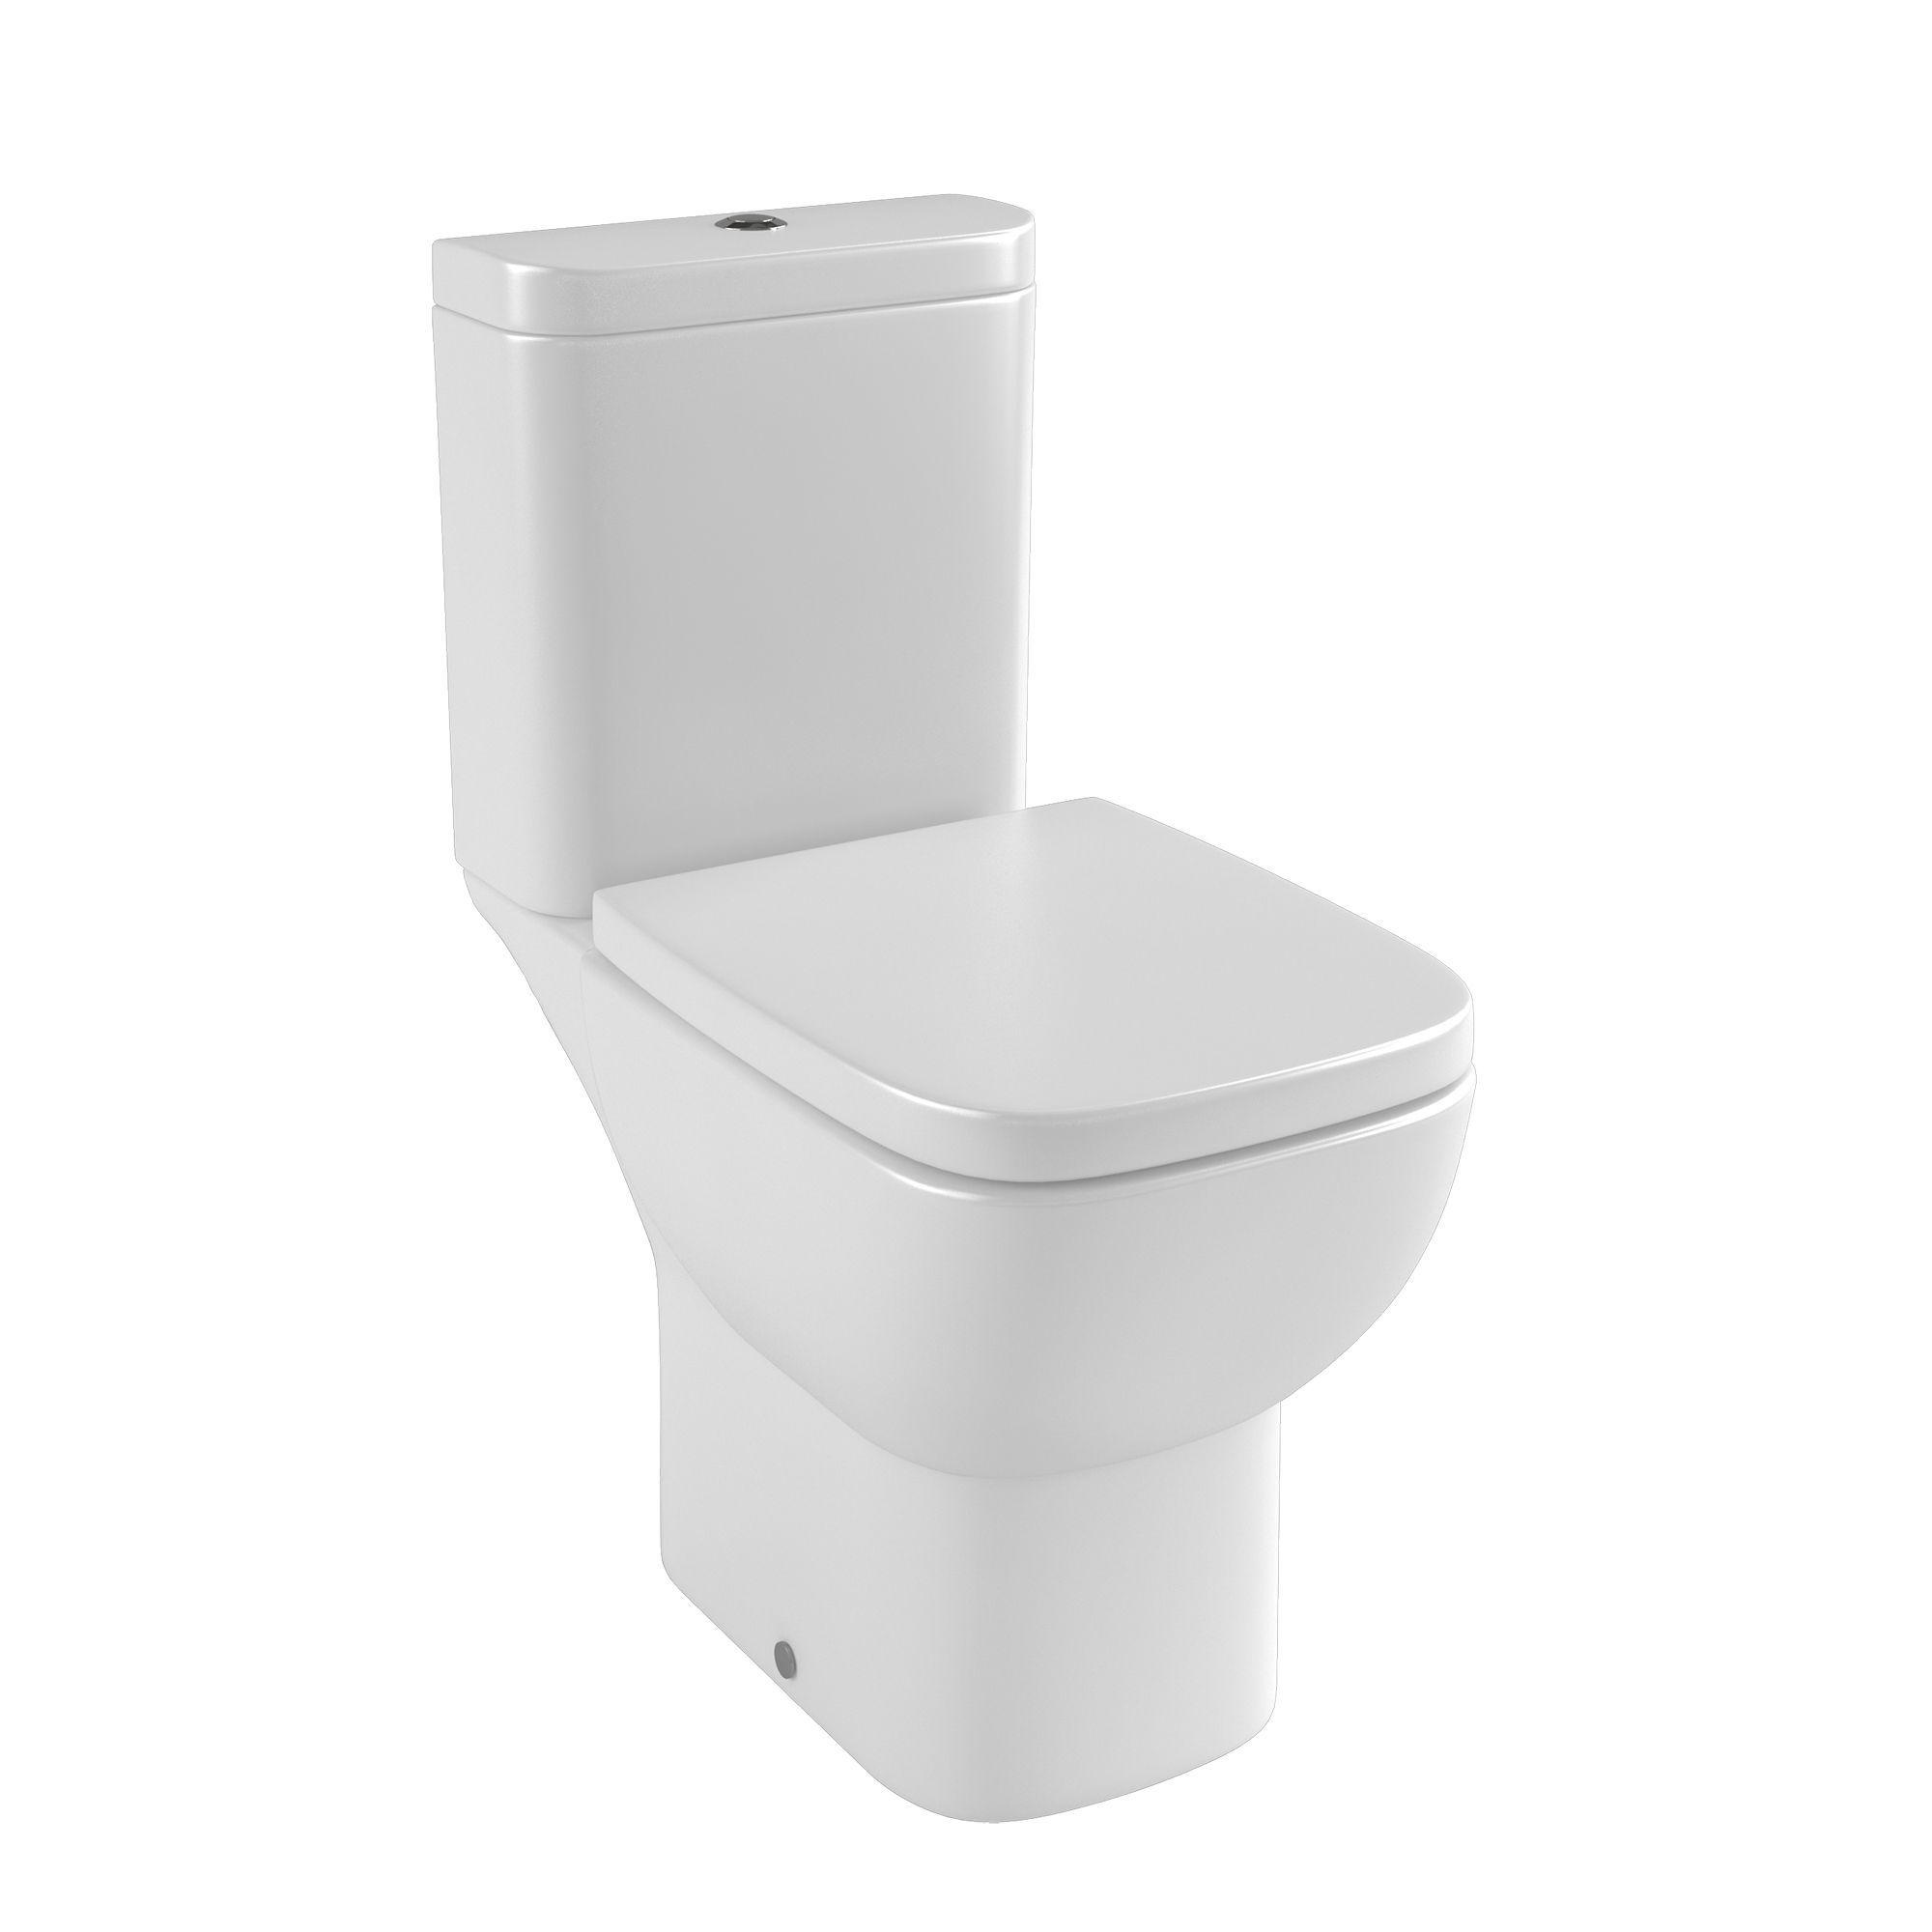 Cooke Amp Lewis Santoro Contemporary Close Coupled Toilet